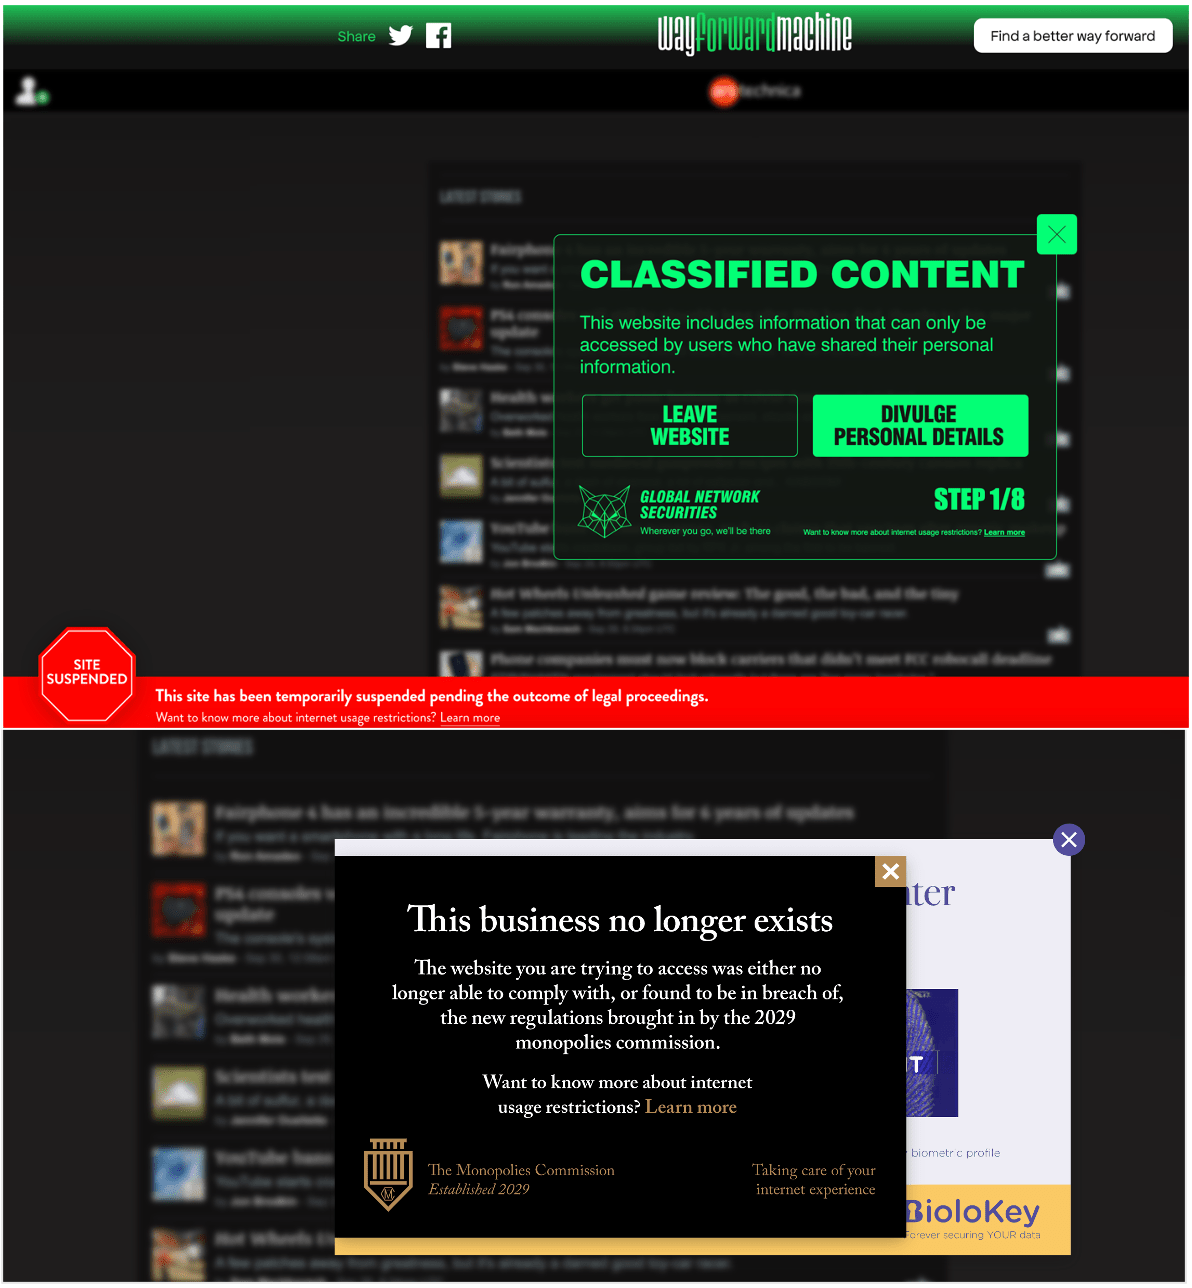 Wayforward Machine results for arstechnica.com.